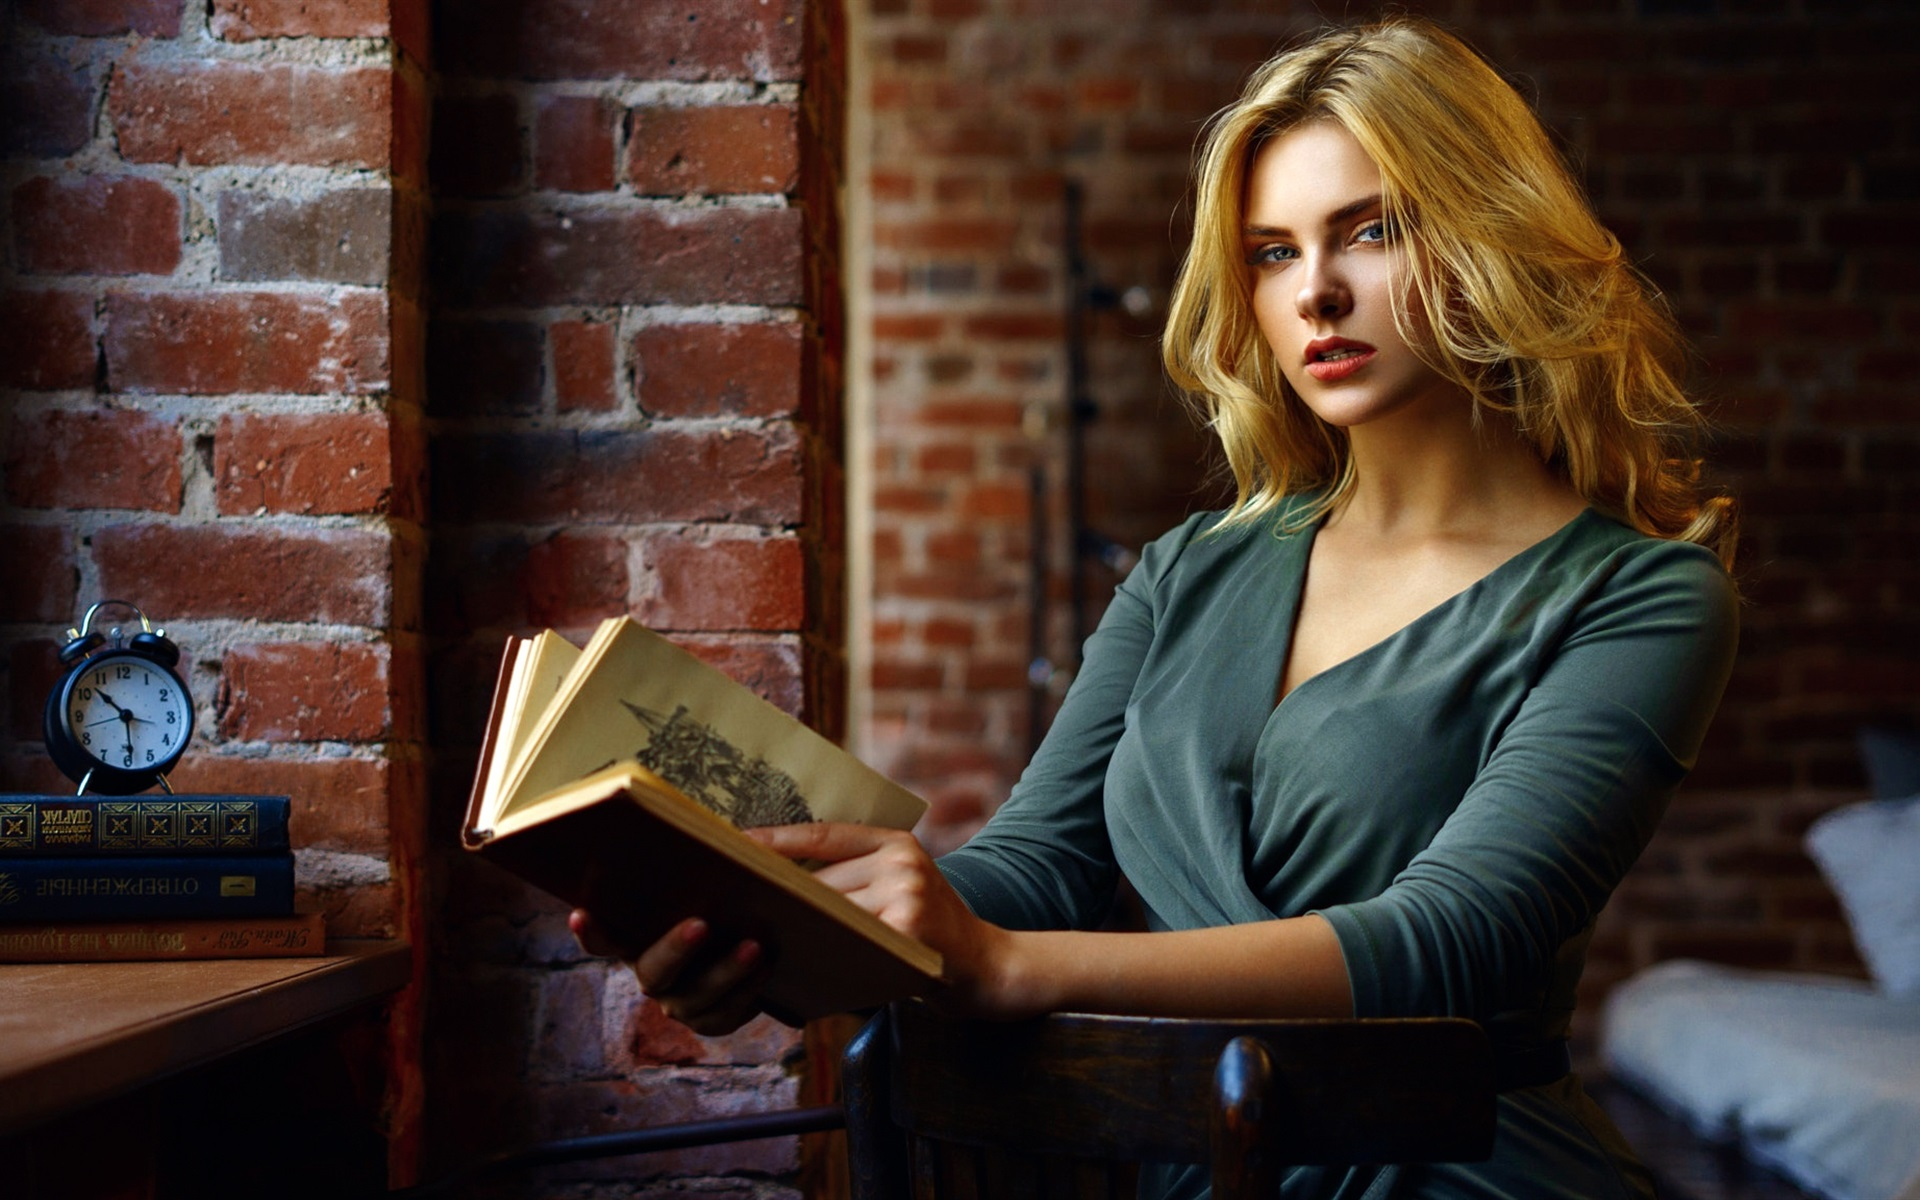 Wallpaper Blonde Girl Reading Book Bricks Wall 1920x1200 Hd